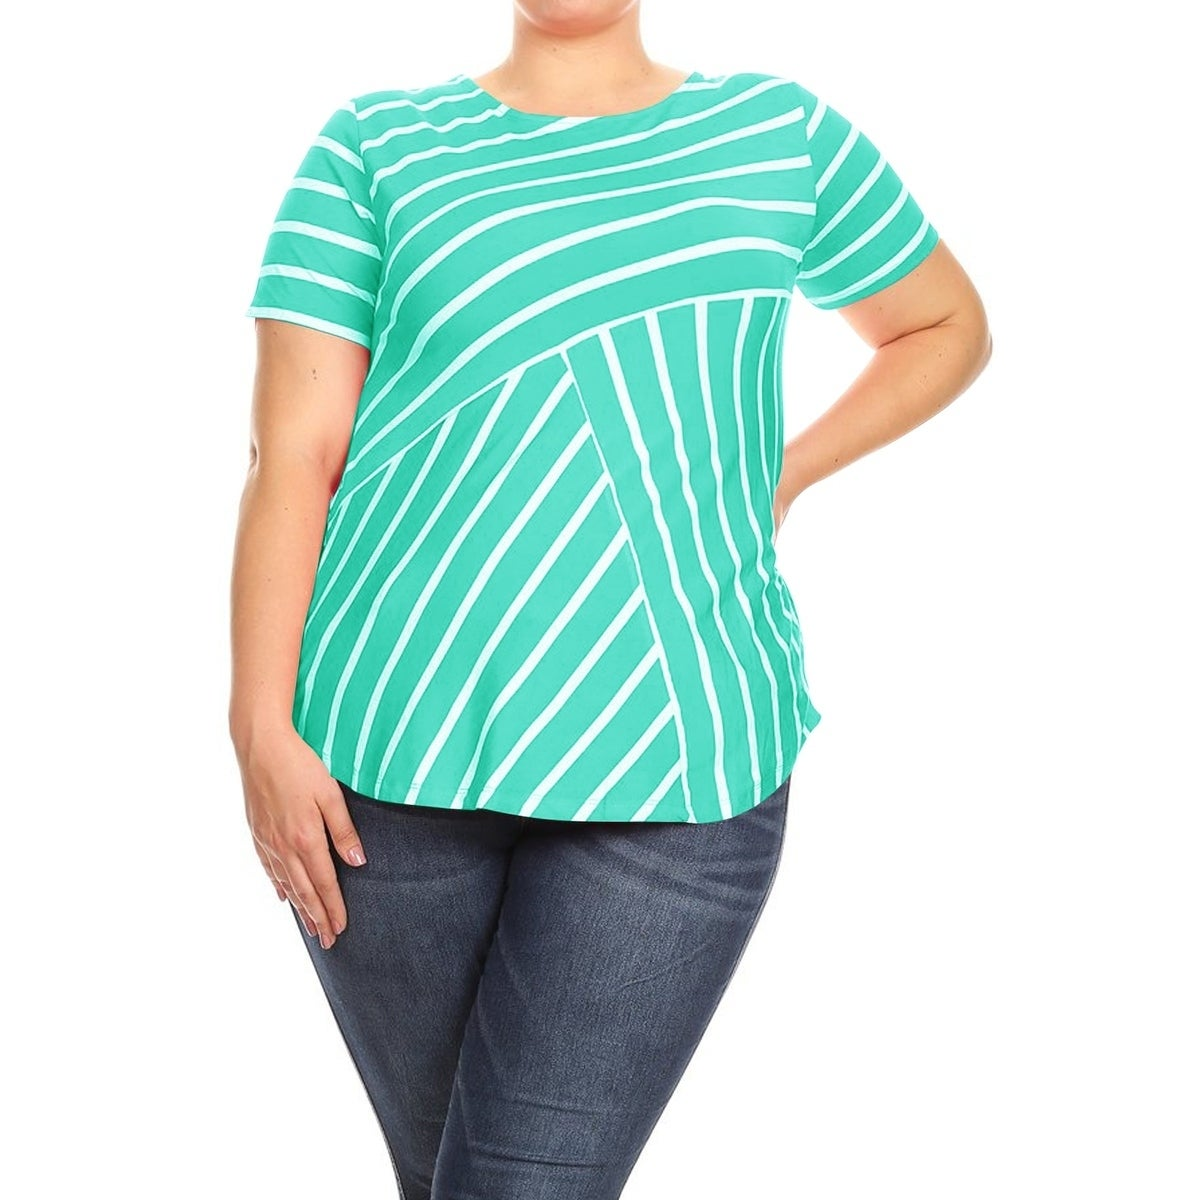 Fashion Women Short Sleeve Fishnet Panel Plus Size Tunic T-shirt Applique Tops